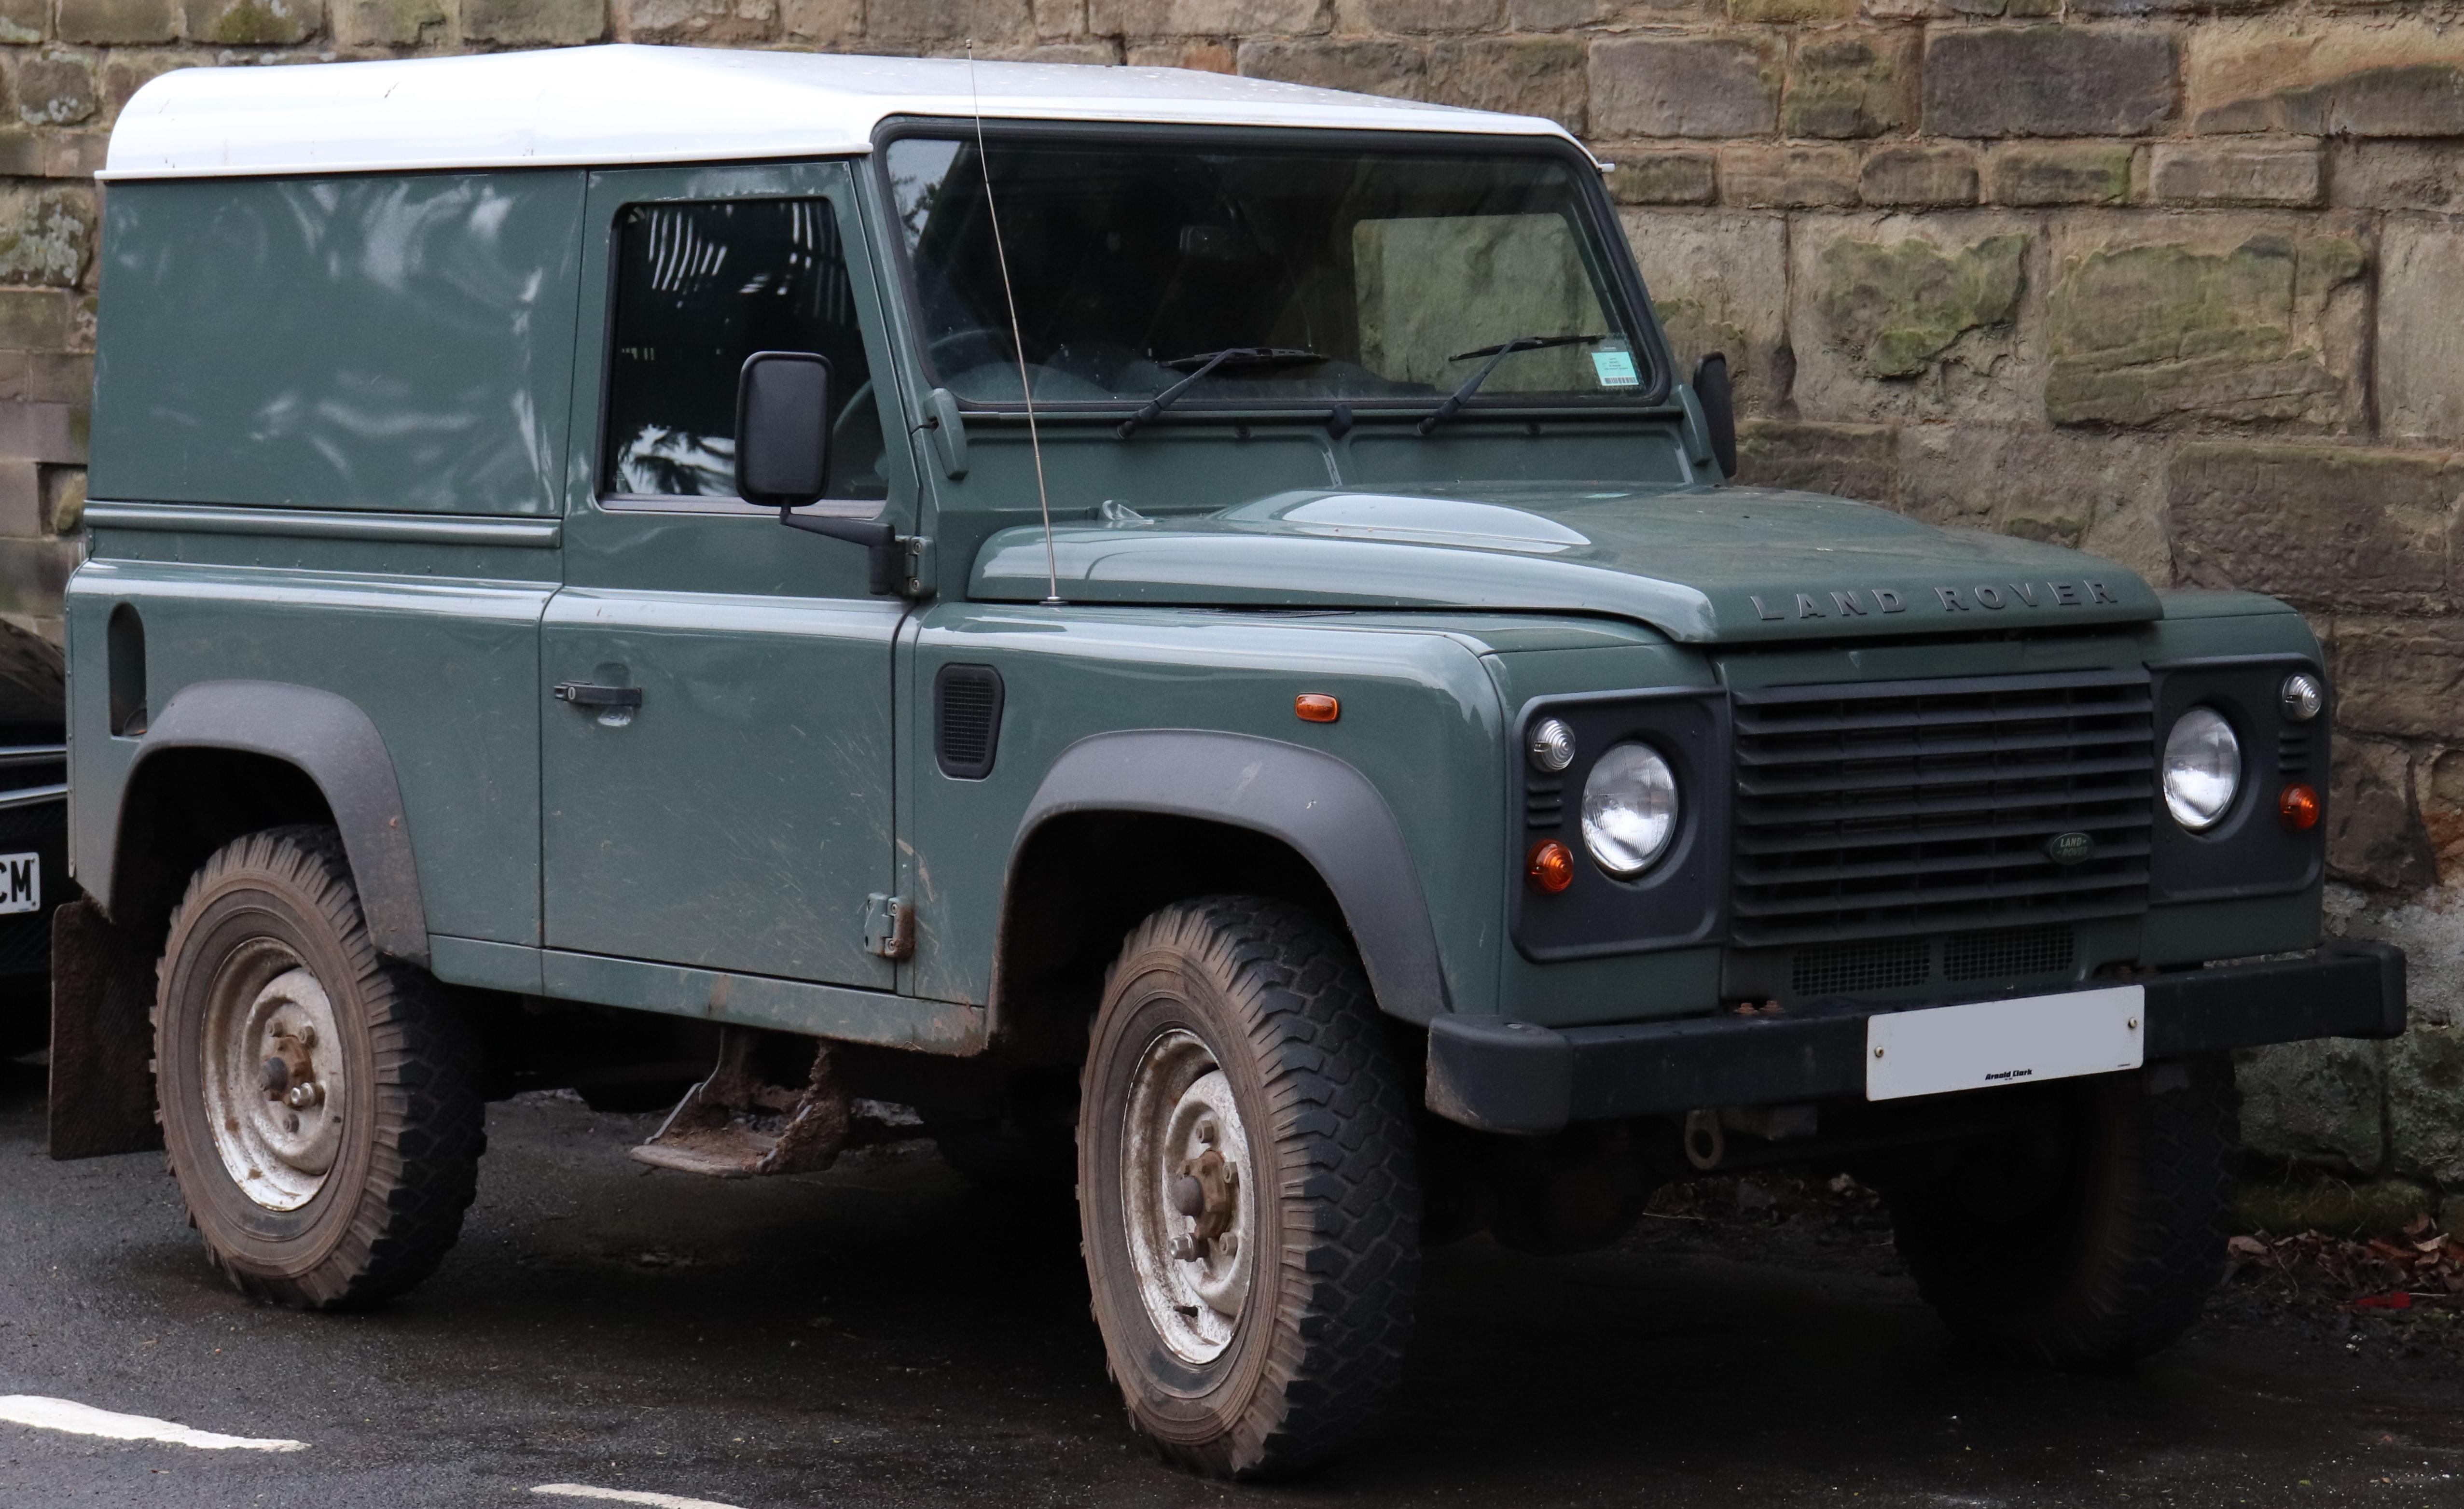 https://upload.wikimedia.org/wikipedia/commons/1/16/2013_Land_Rover_Defender_90_Hardtop_TD_2.2.jpg